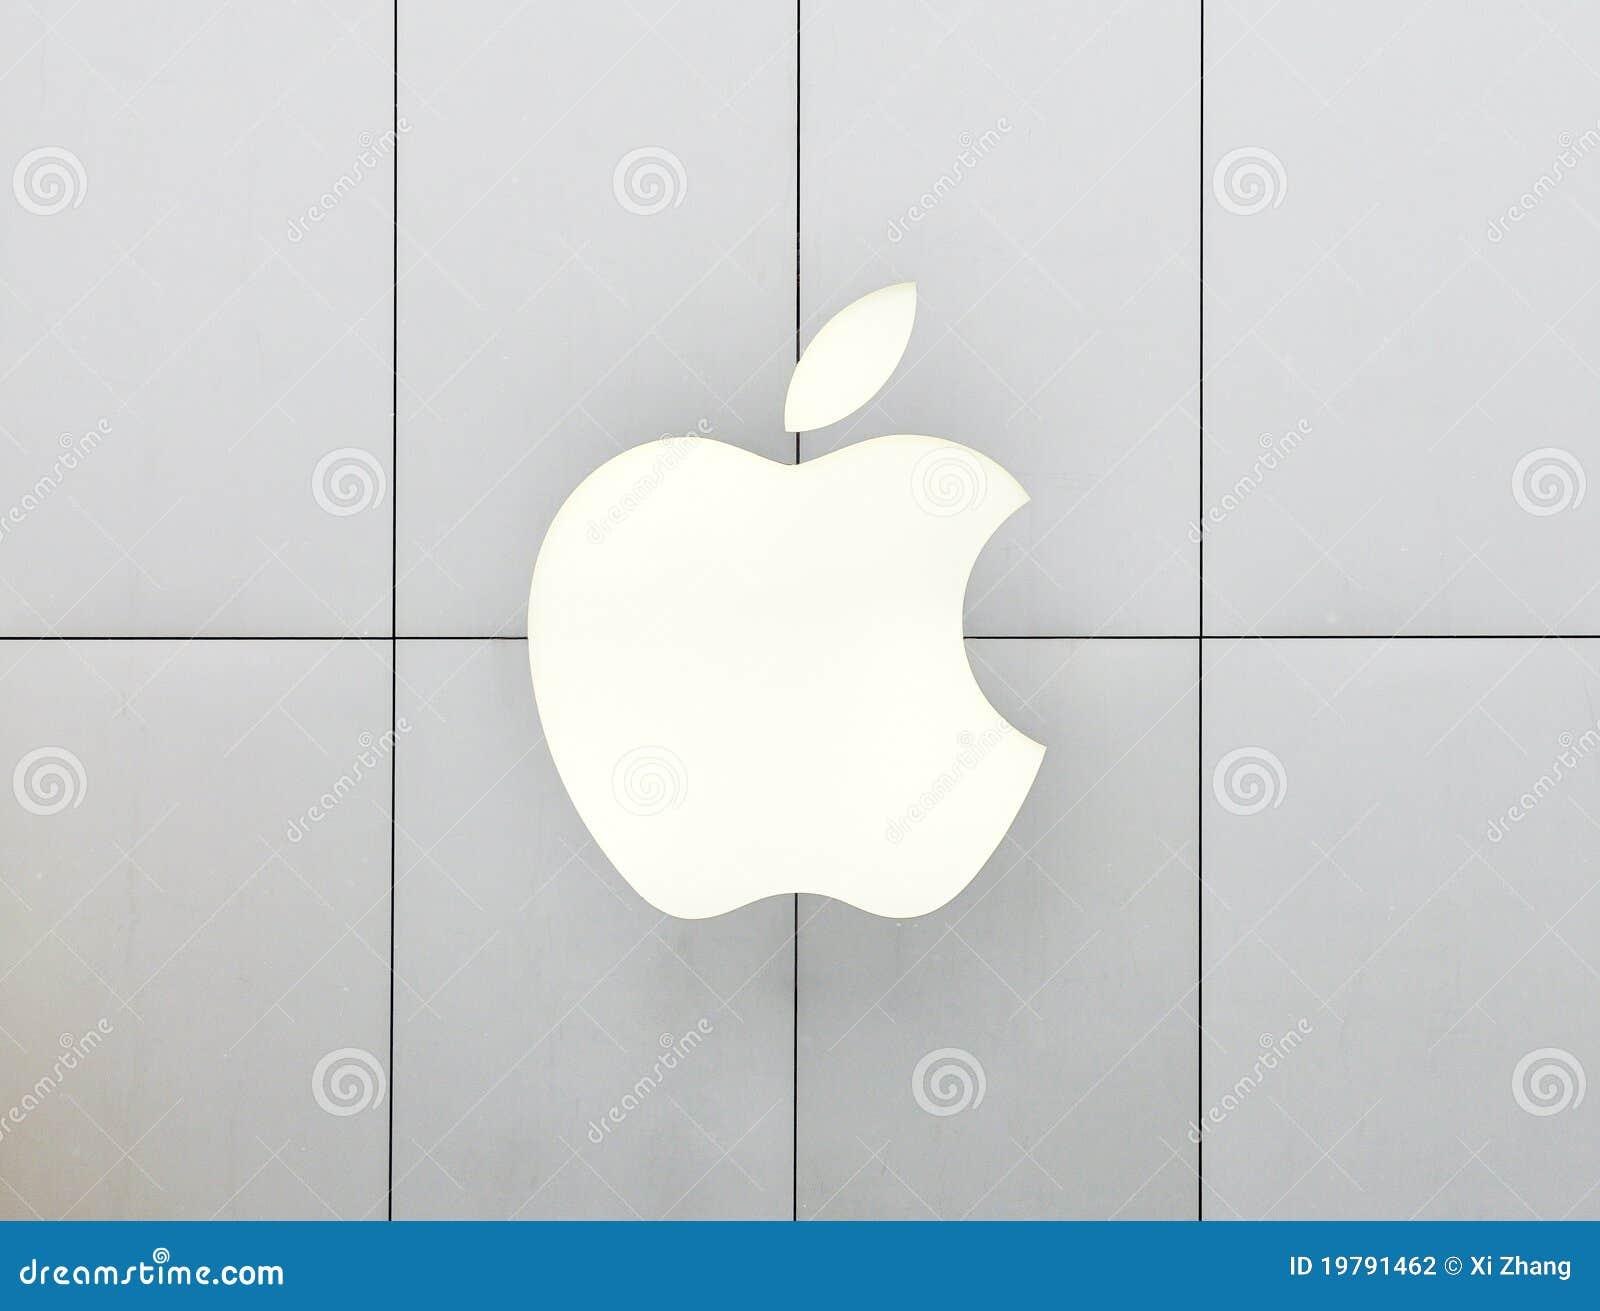 Apple徽标霓虹灯